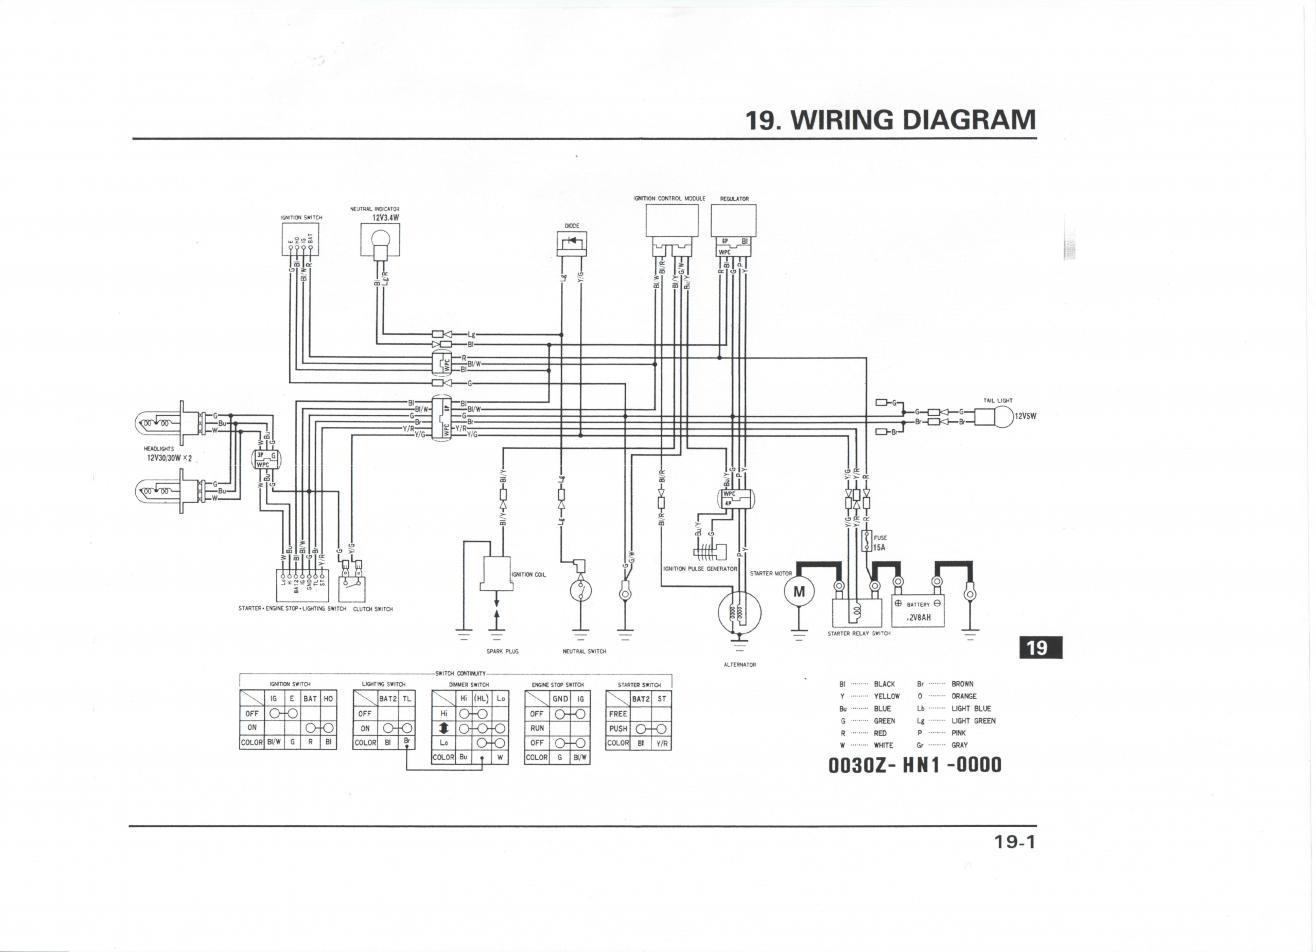 Swell Honda Trx400Ex Wiring Diagram Wiring Diagram Wiring Cloud Hemtegremohammedshrineorg